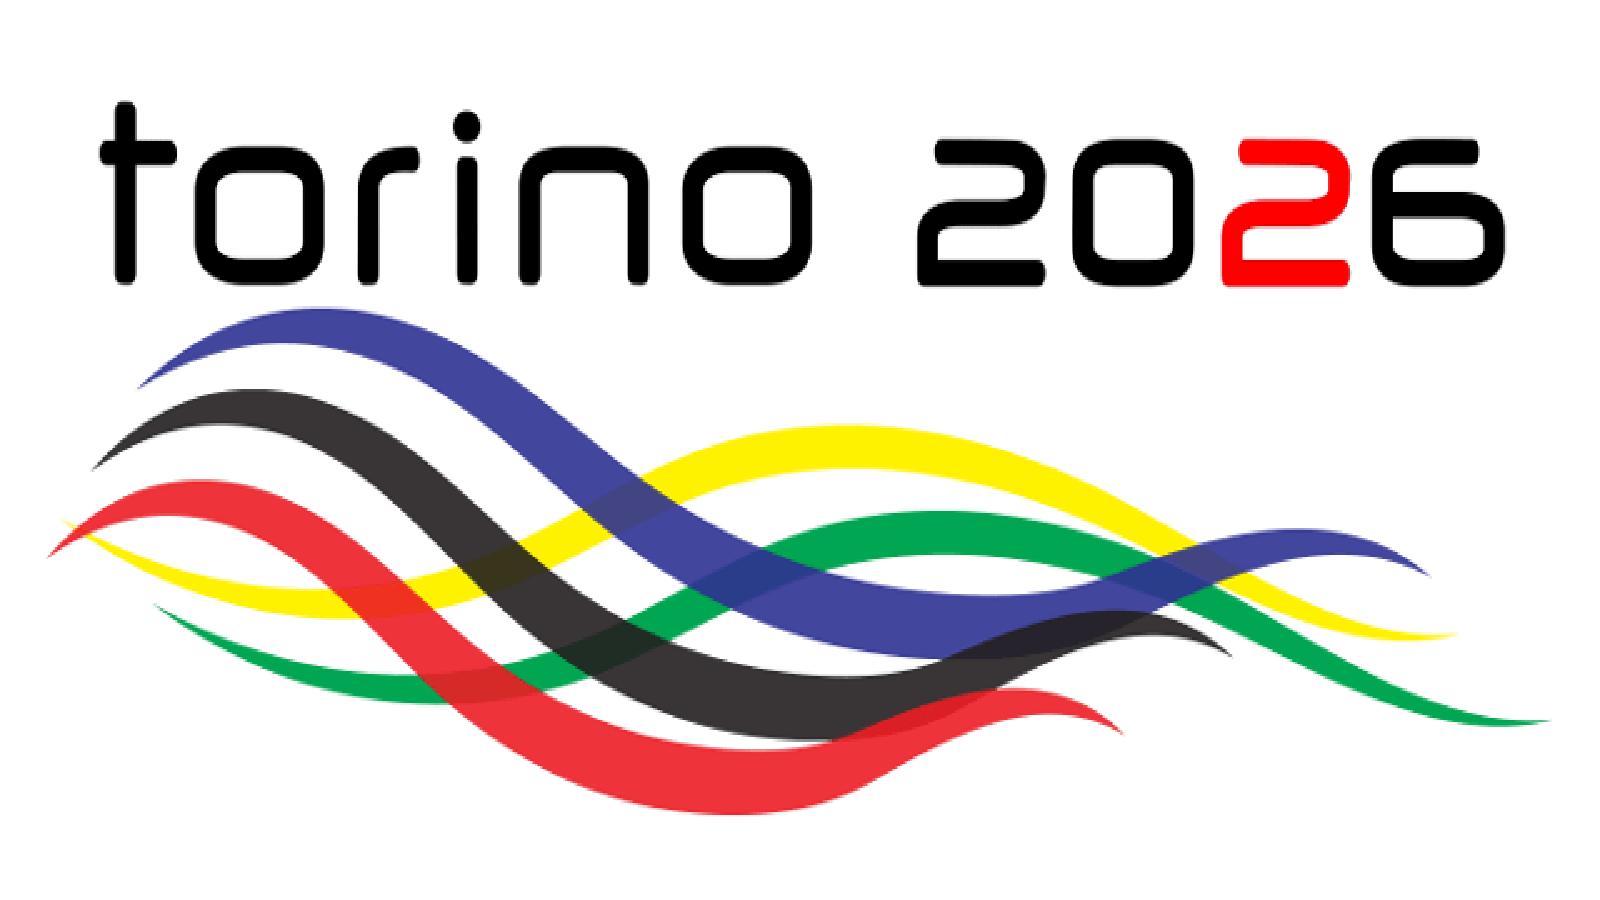 Olimpiadi di Torino, Appendino minaccia dimissioni